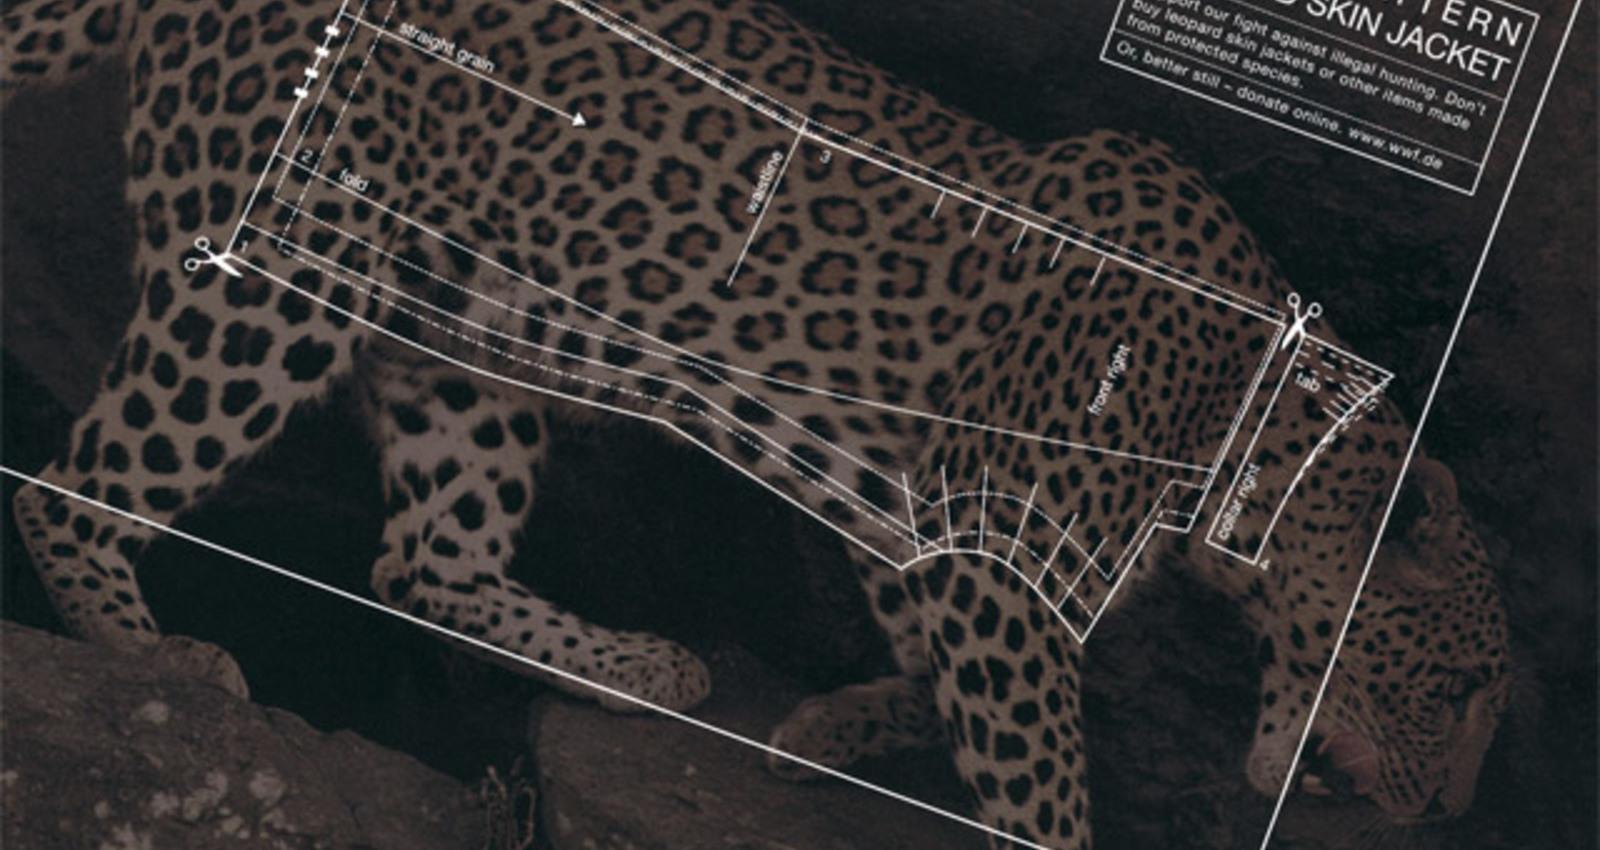 Leopard, Crocodile, Seal